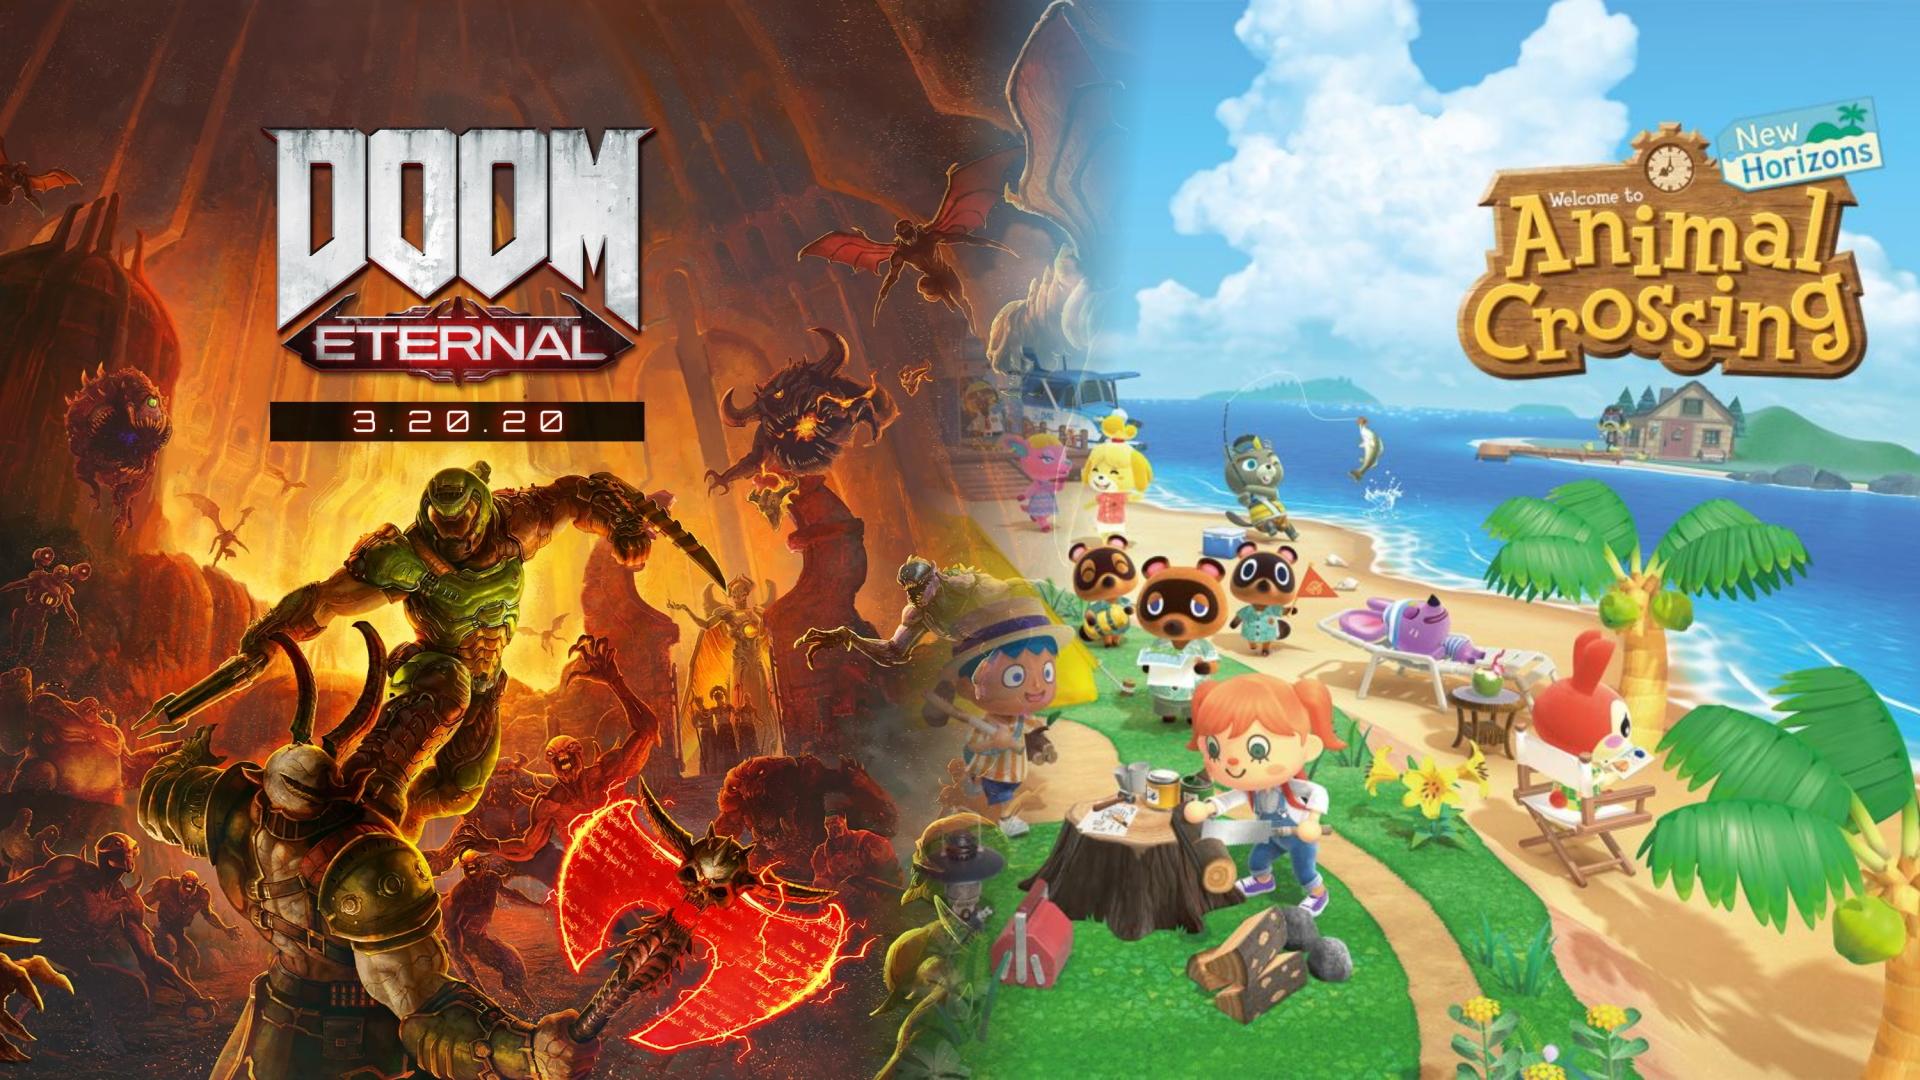 One Copy Of Doom Eternal Animal Crossing New Horizons Please